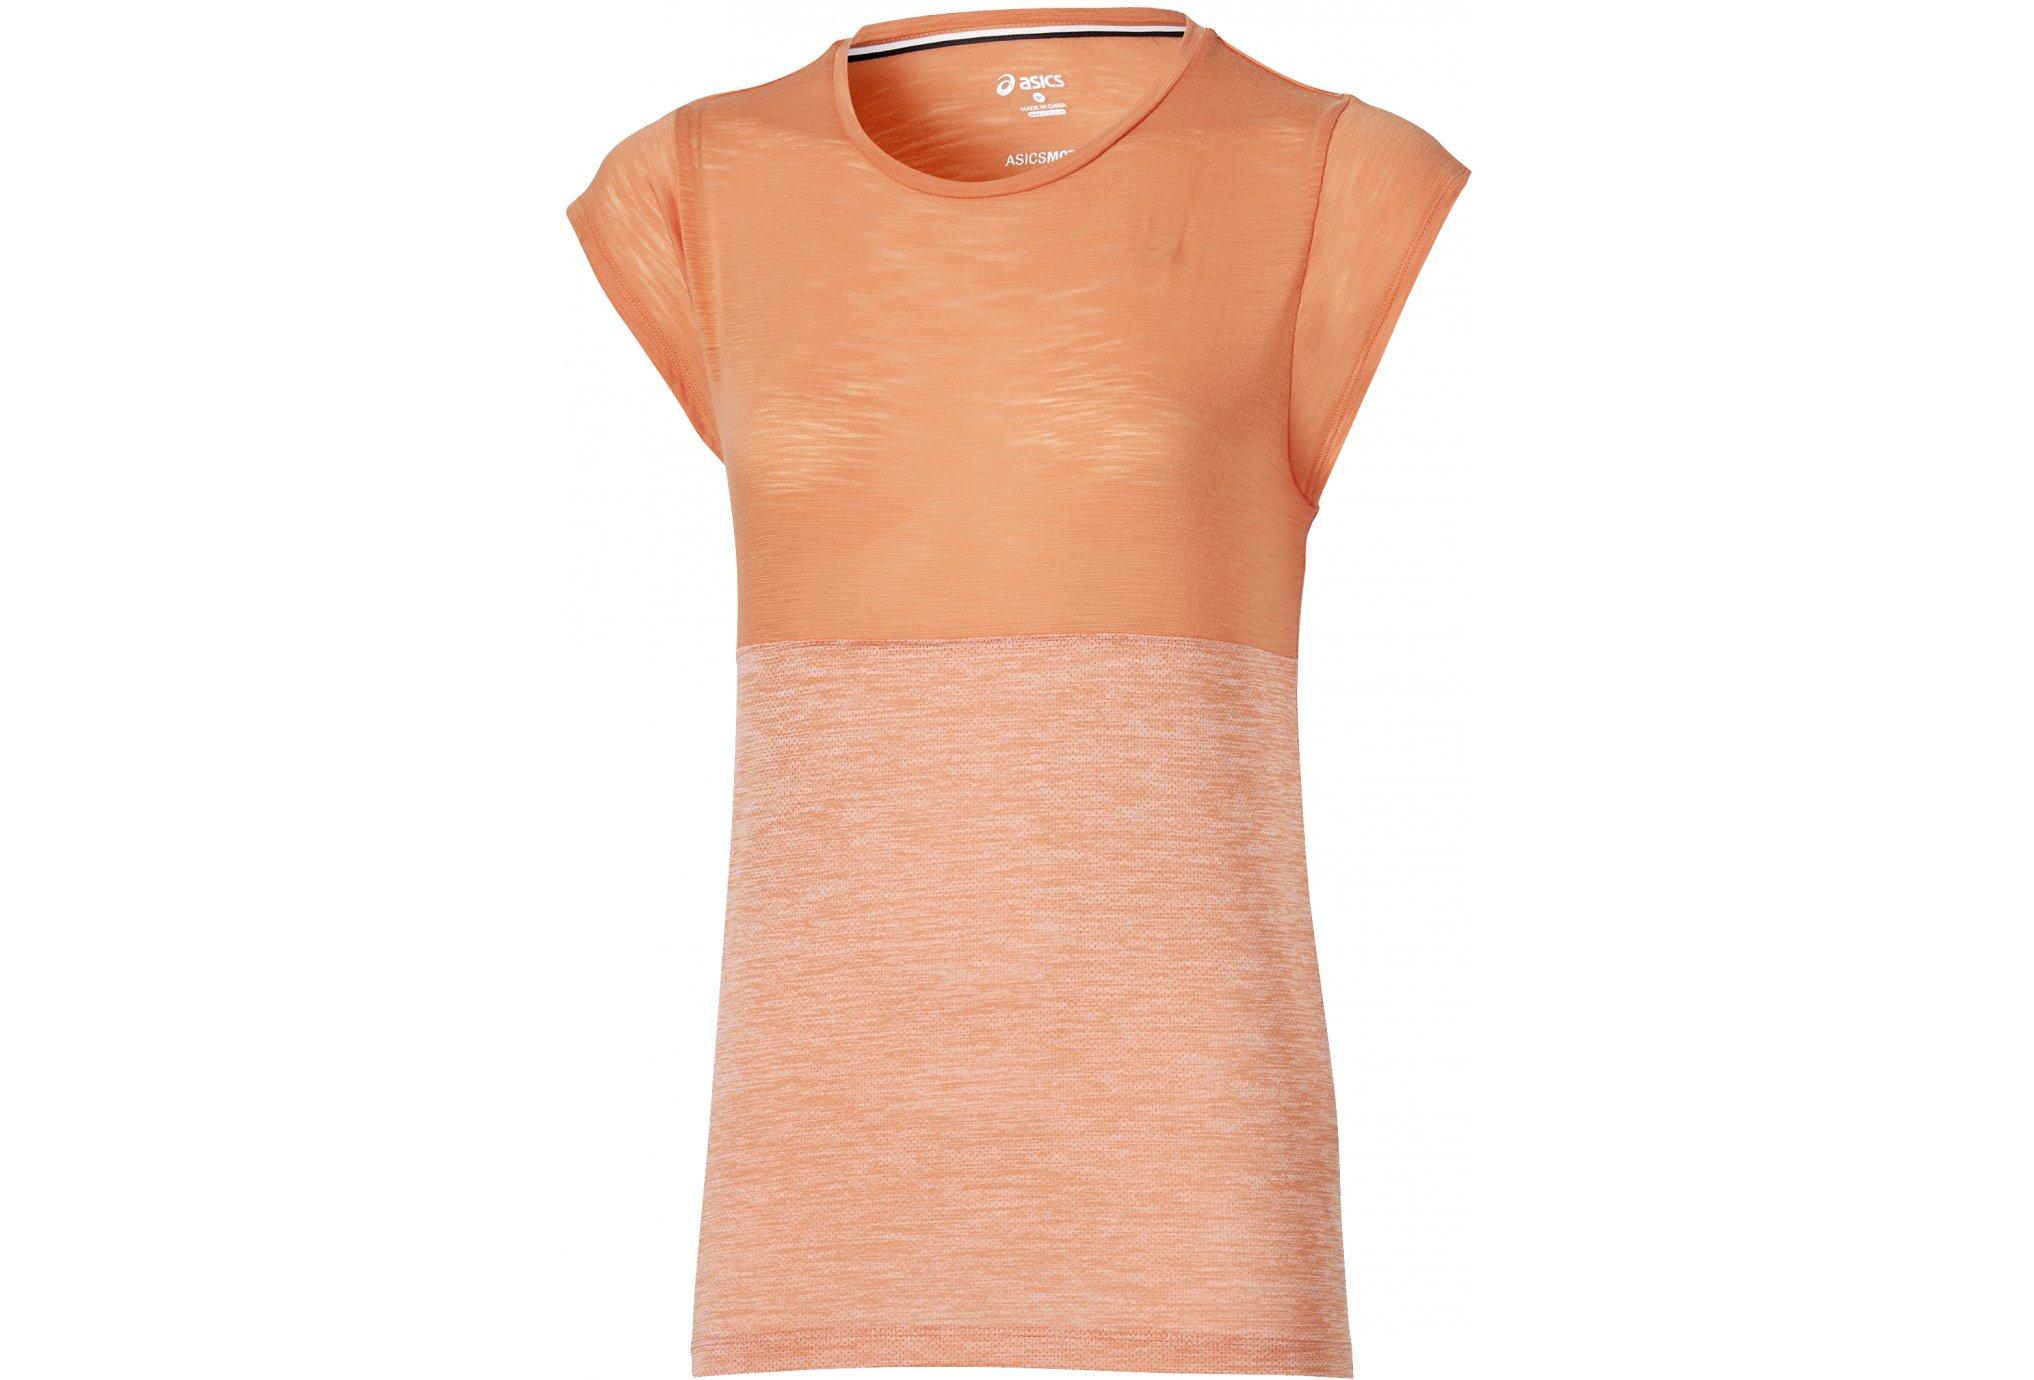 Asics Tee-shirt Mesh W Diététique Vêtements femme